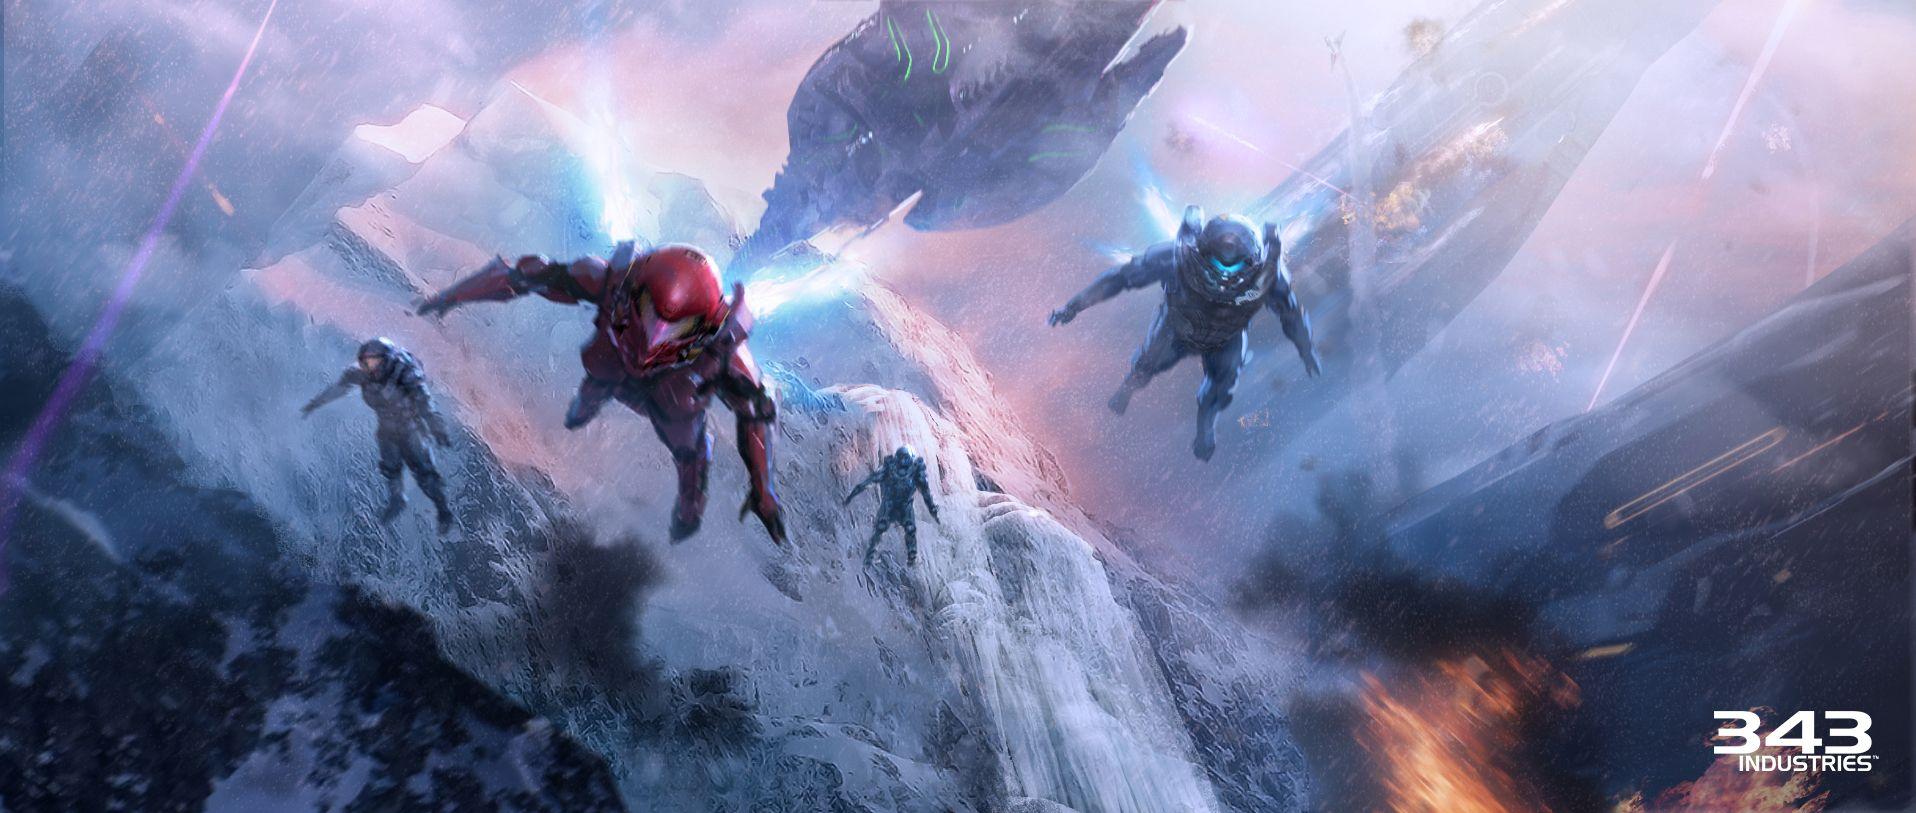 Halo 5 Guardians-082